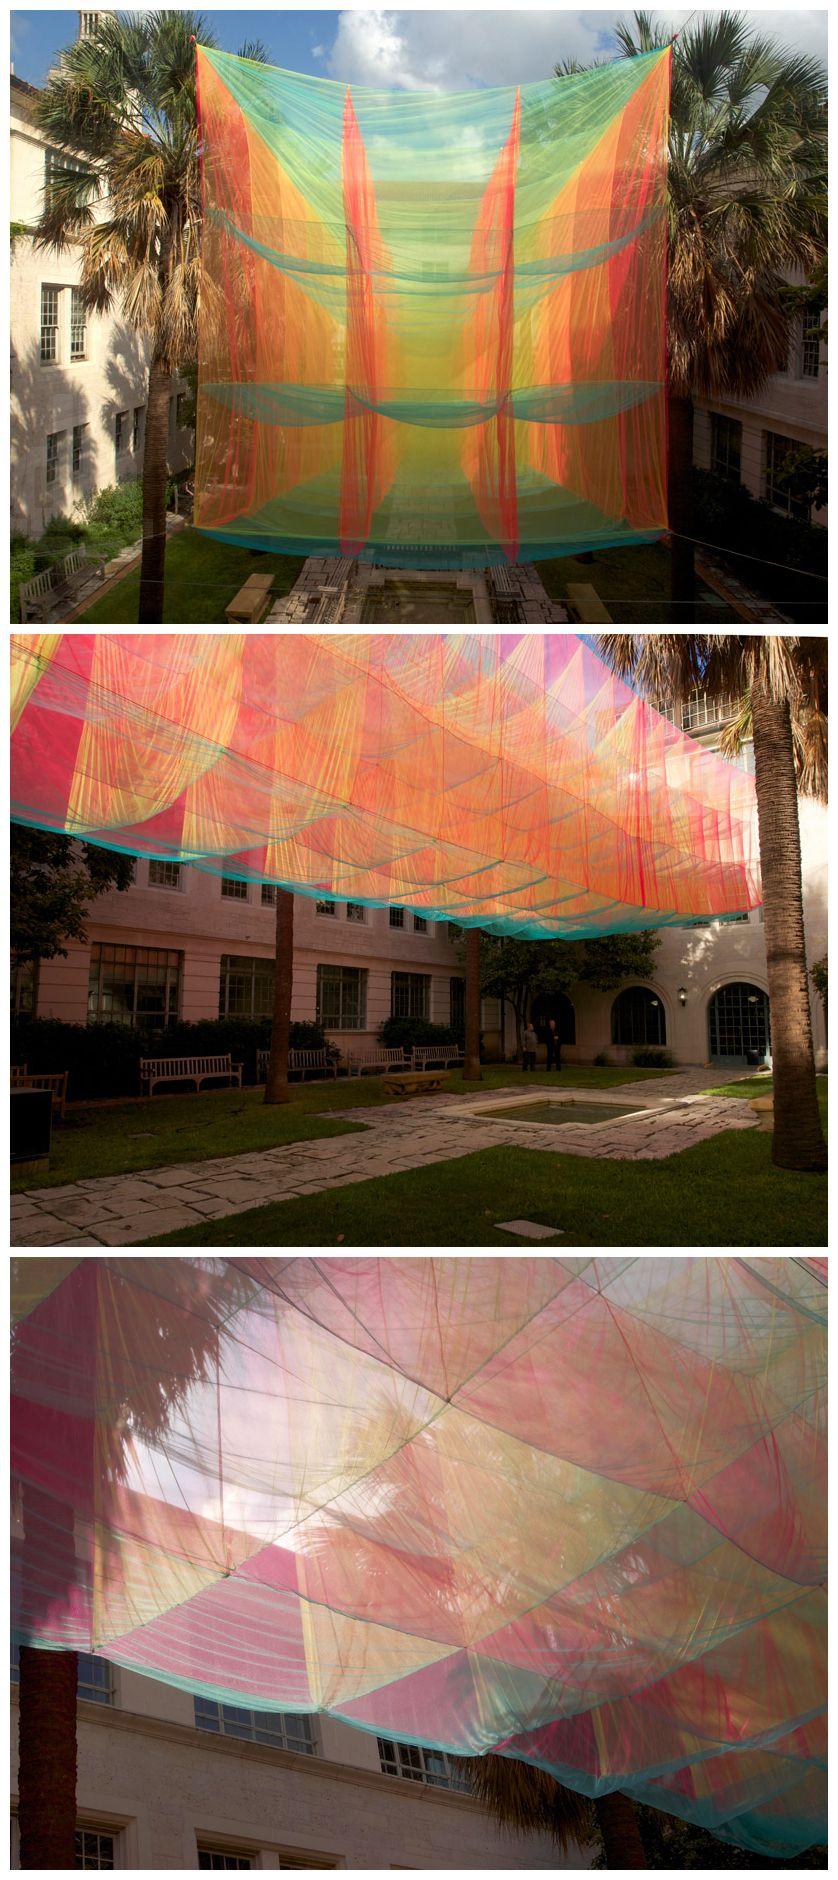 Akane Moriyama Suspends Transparent Cubic Prism In Texas